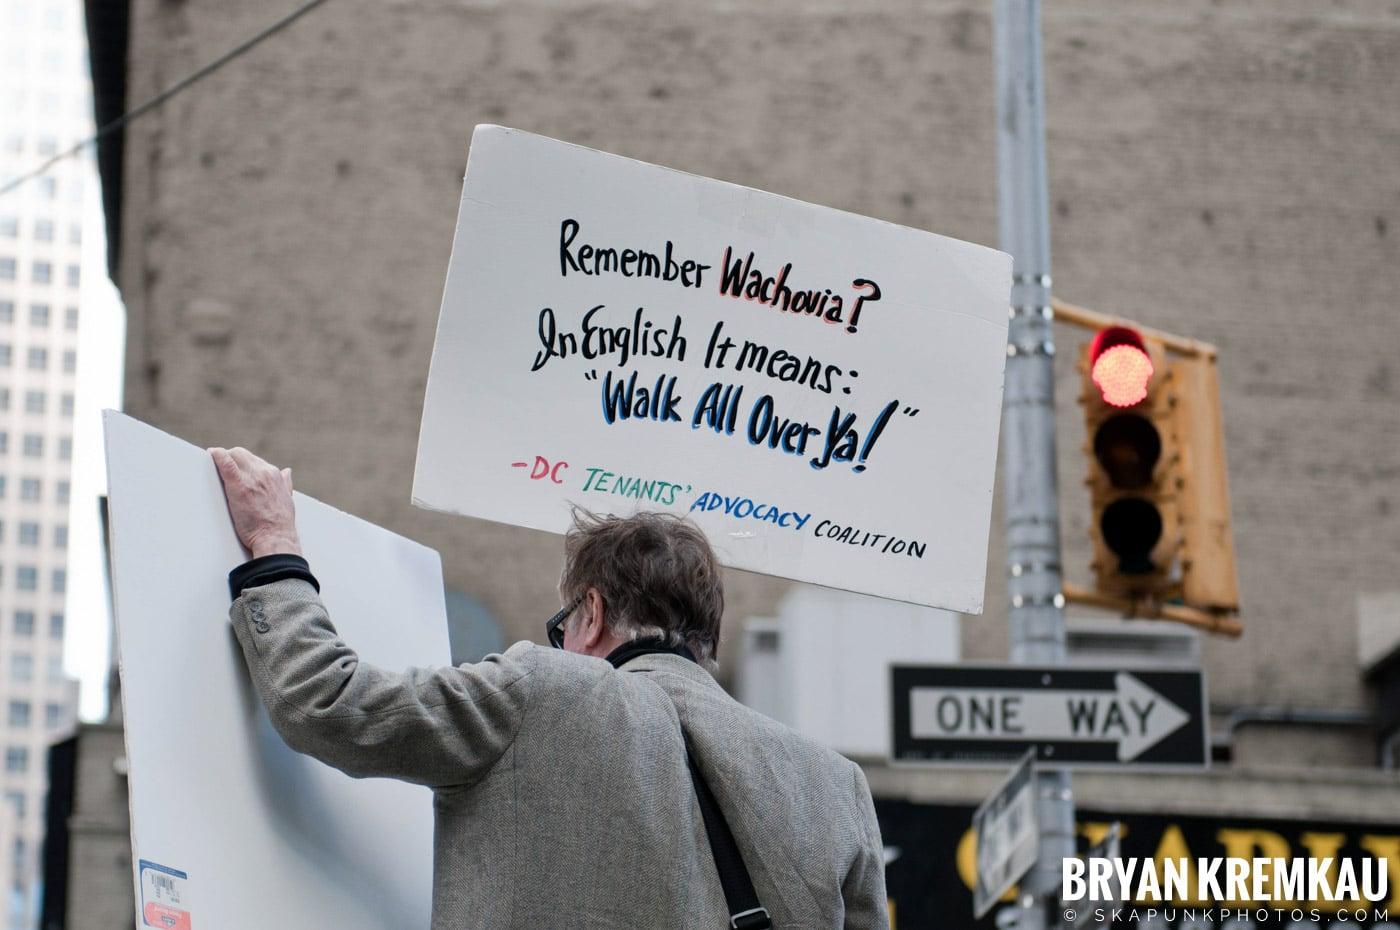 Occupy Wall Street @ Zuccotti Park and Washington Square Park, NYC - 10.15.11 (101)